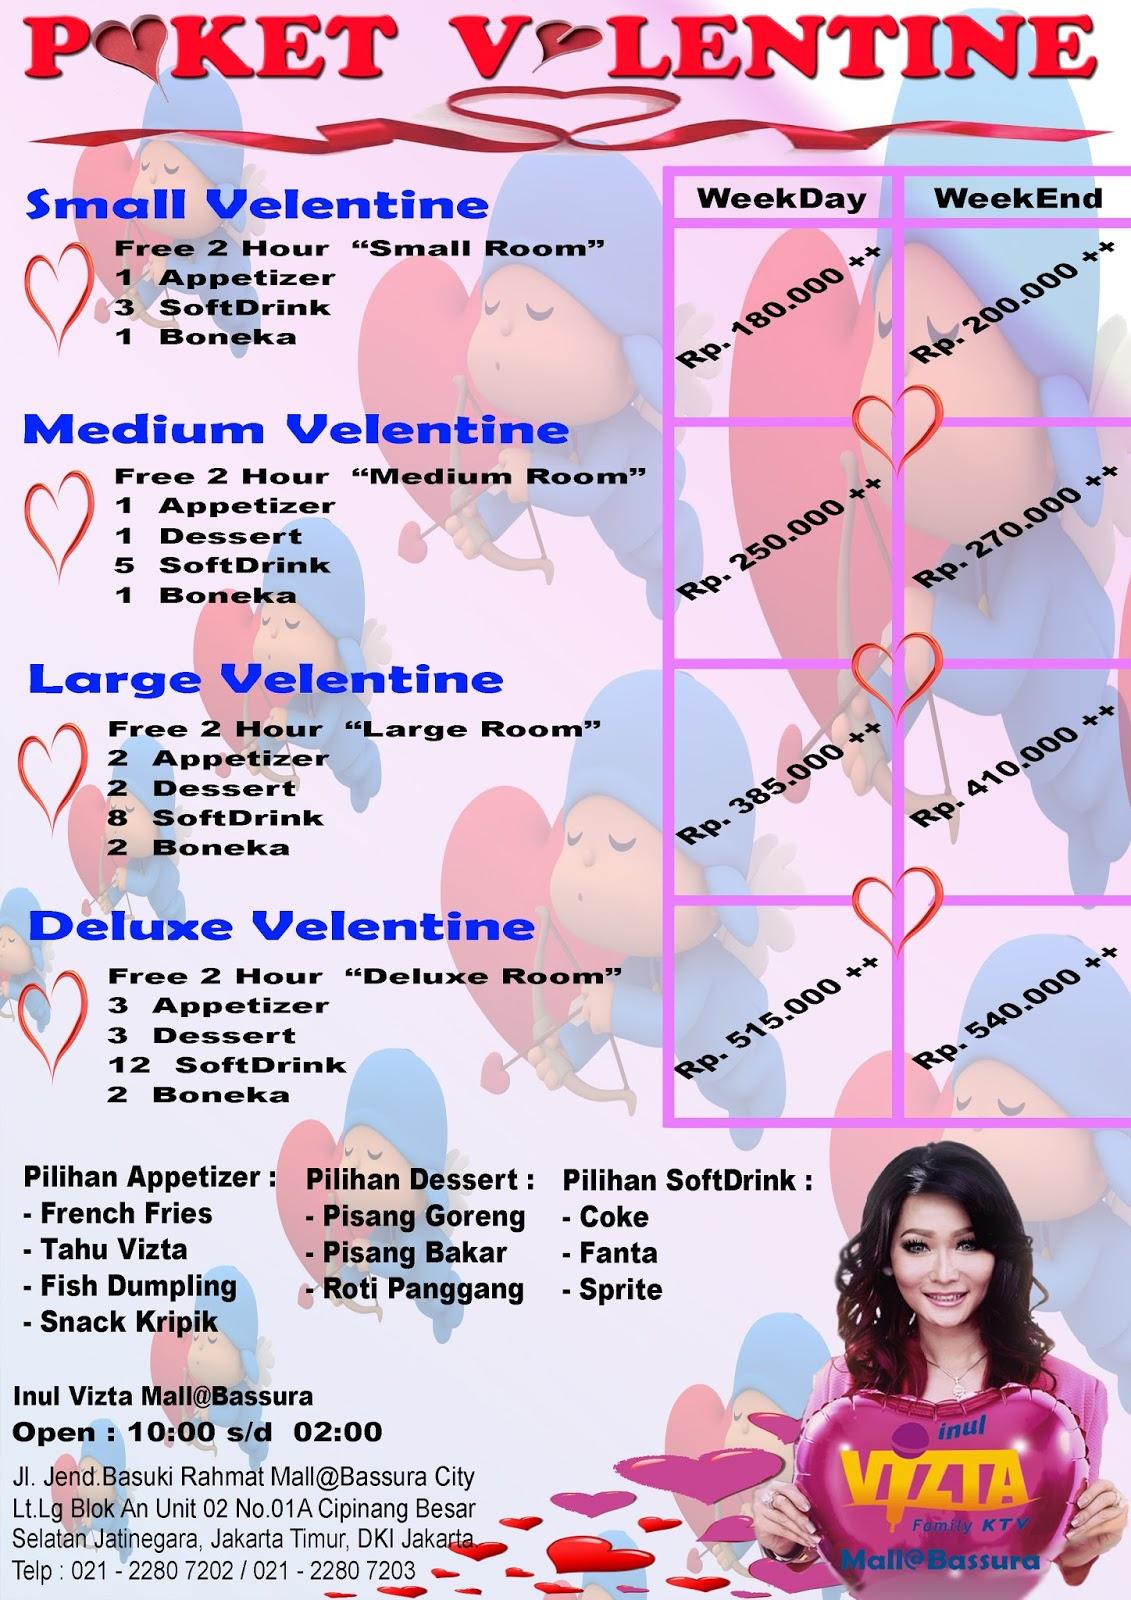 Paket Valentine | Inul Vizta Mall@Bassura